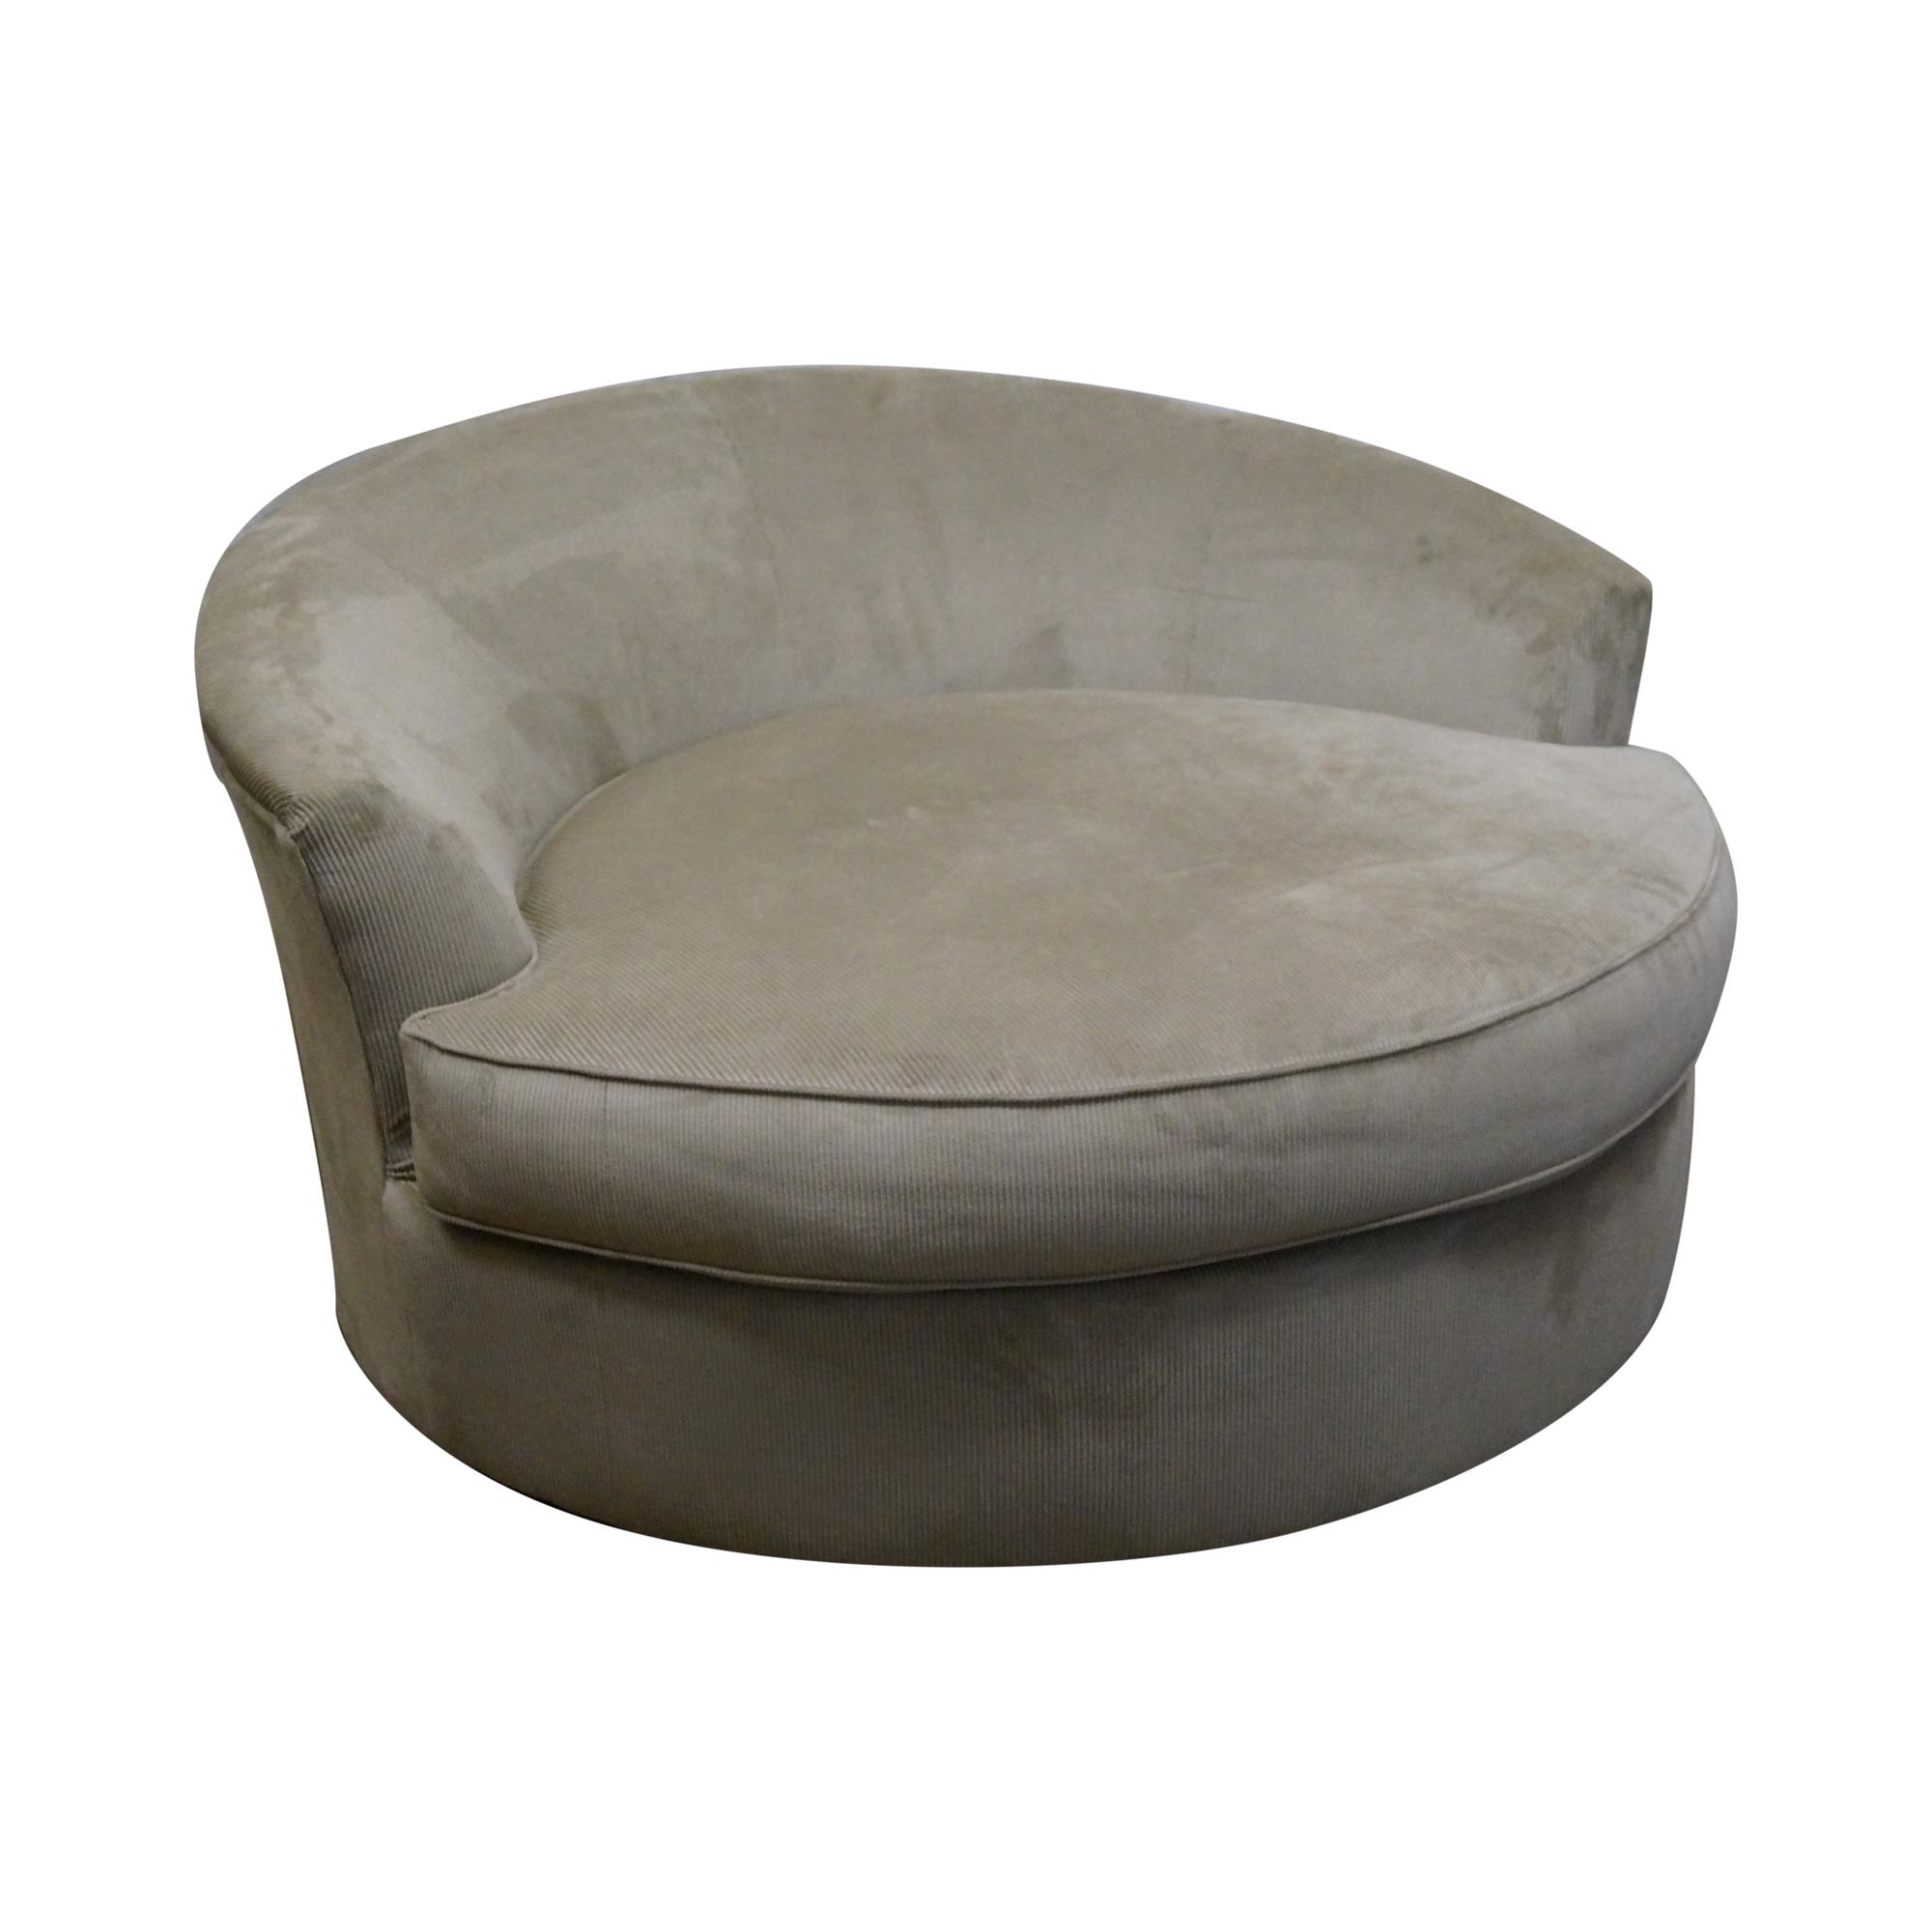 Milo Baughman - Round Revolving Swivel Chair Loveseat ...